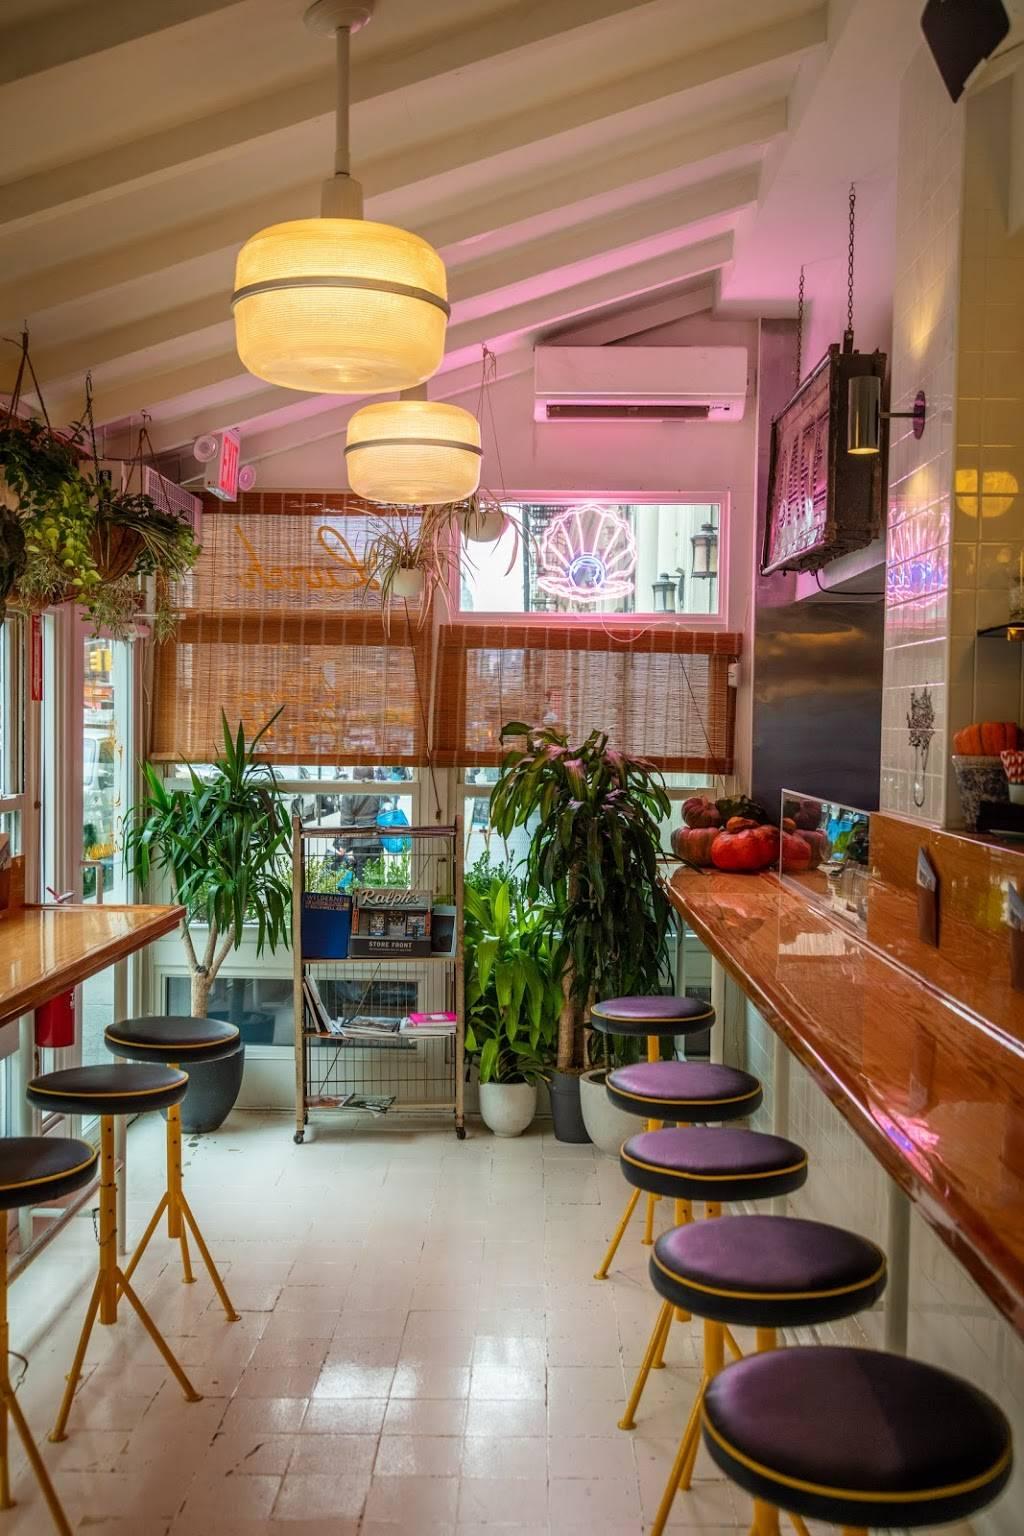 A Summer Day Café | restaurant | 109 W Broadway, New York, NY 10013, USA | 6468820420 OR +1 646-882-0420